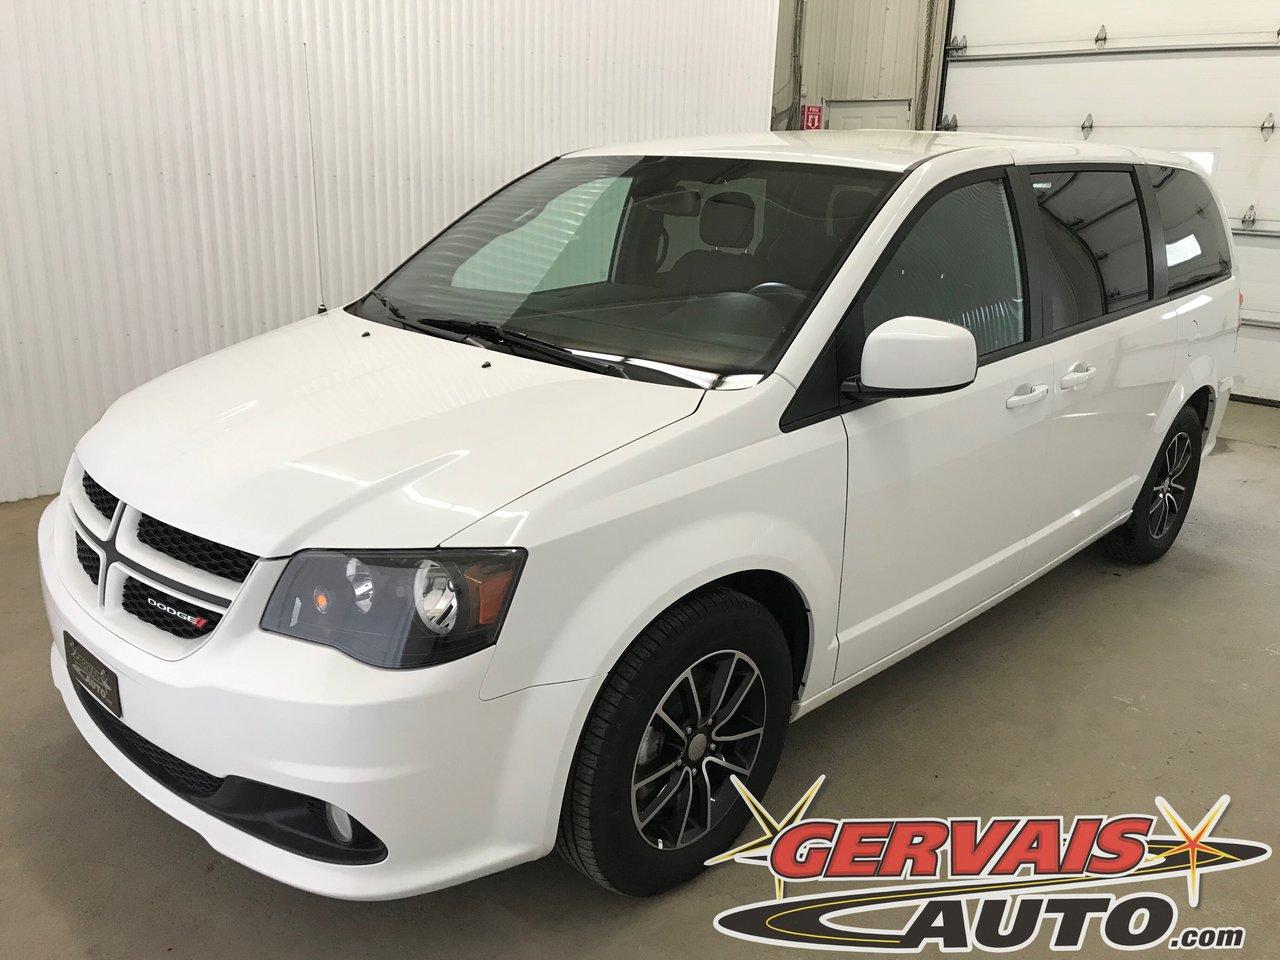 Dodge Grand Caravan 2018 GT Cuir Portes ?lectriques Stow n Go MAGS